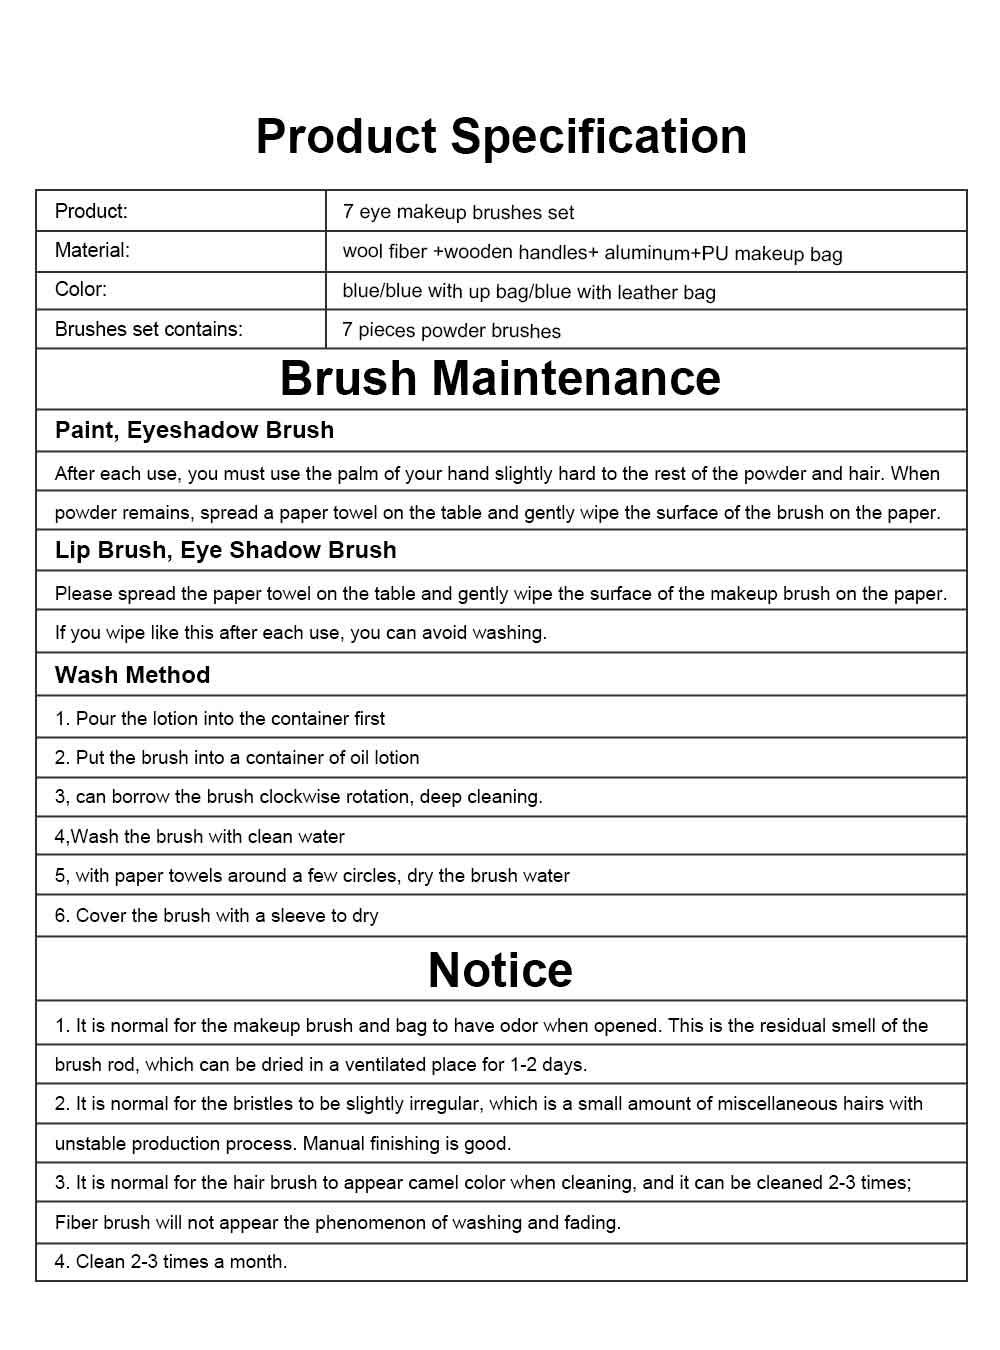 Makeup Brush Set Eye Makeup Brushes for Eye-shadow Concealer Eyeliner Brow Blending Brush Cosmetic Tool 7